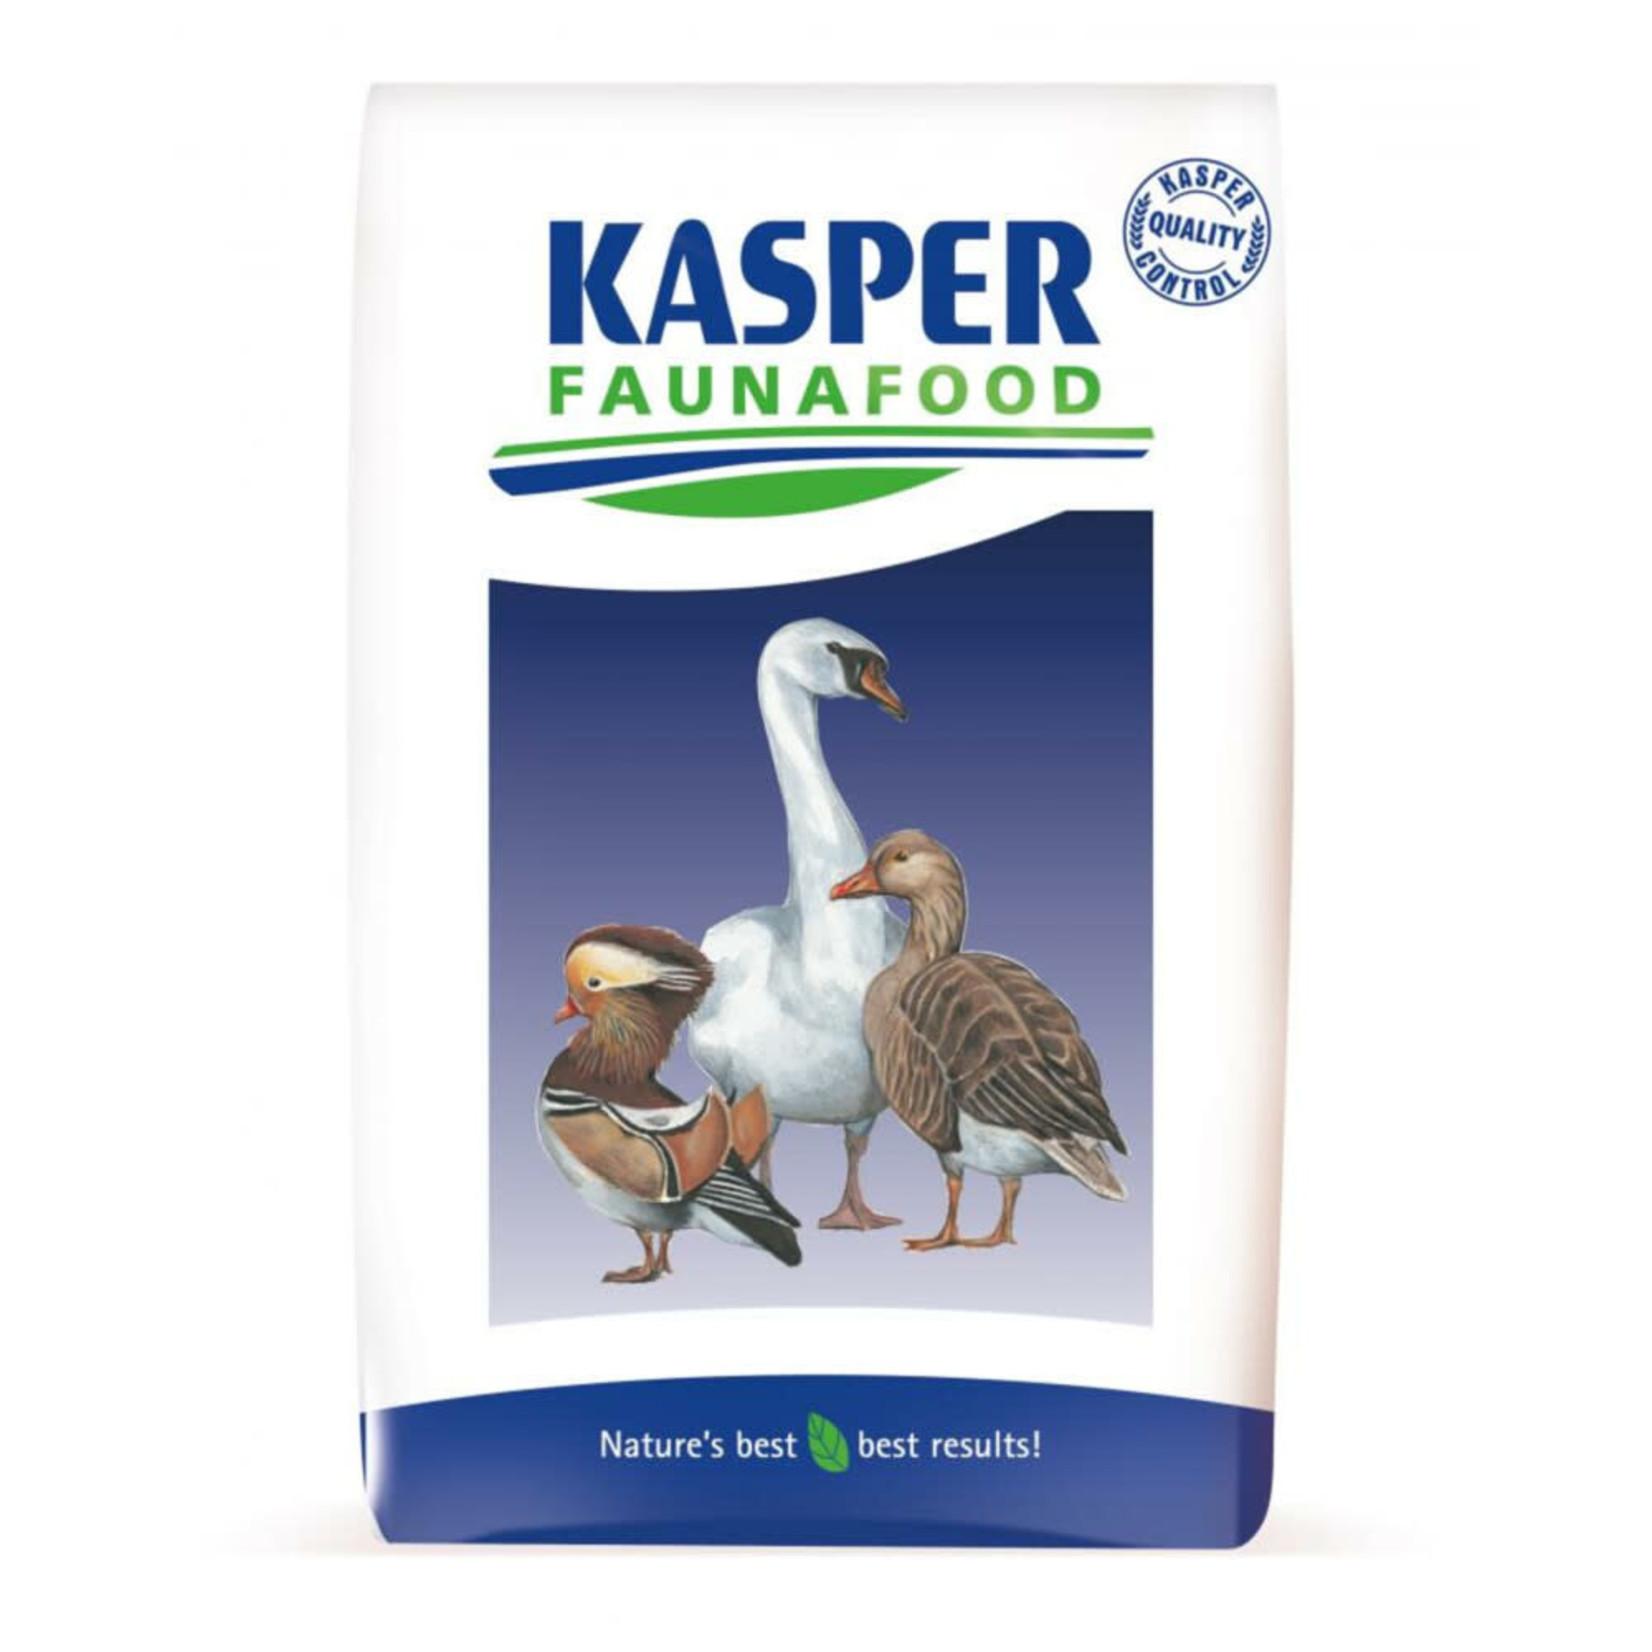 Kasper Faunaf. KFF Sierwater (Anseres) 1 - Opfokkorrel  0-8 wkn 20 KG